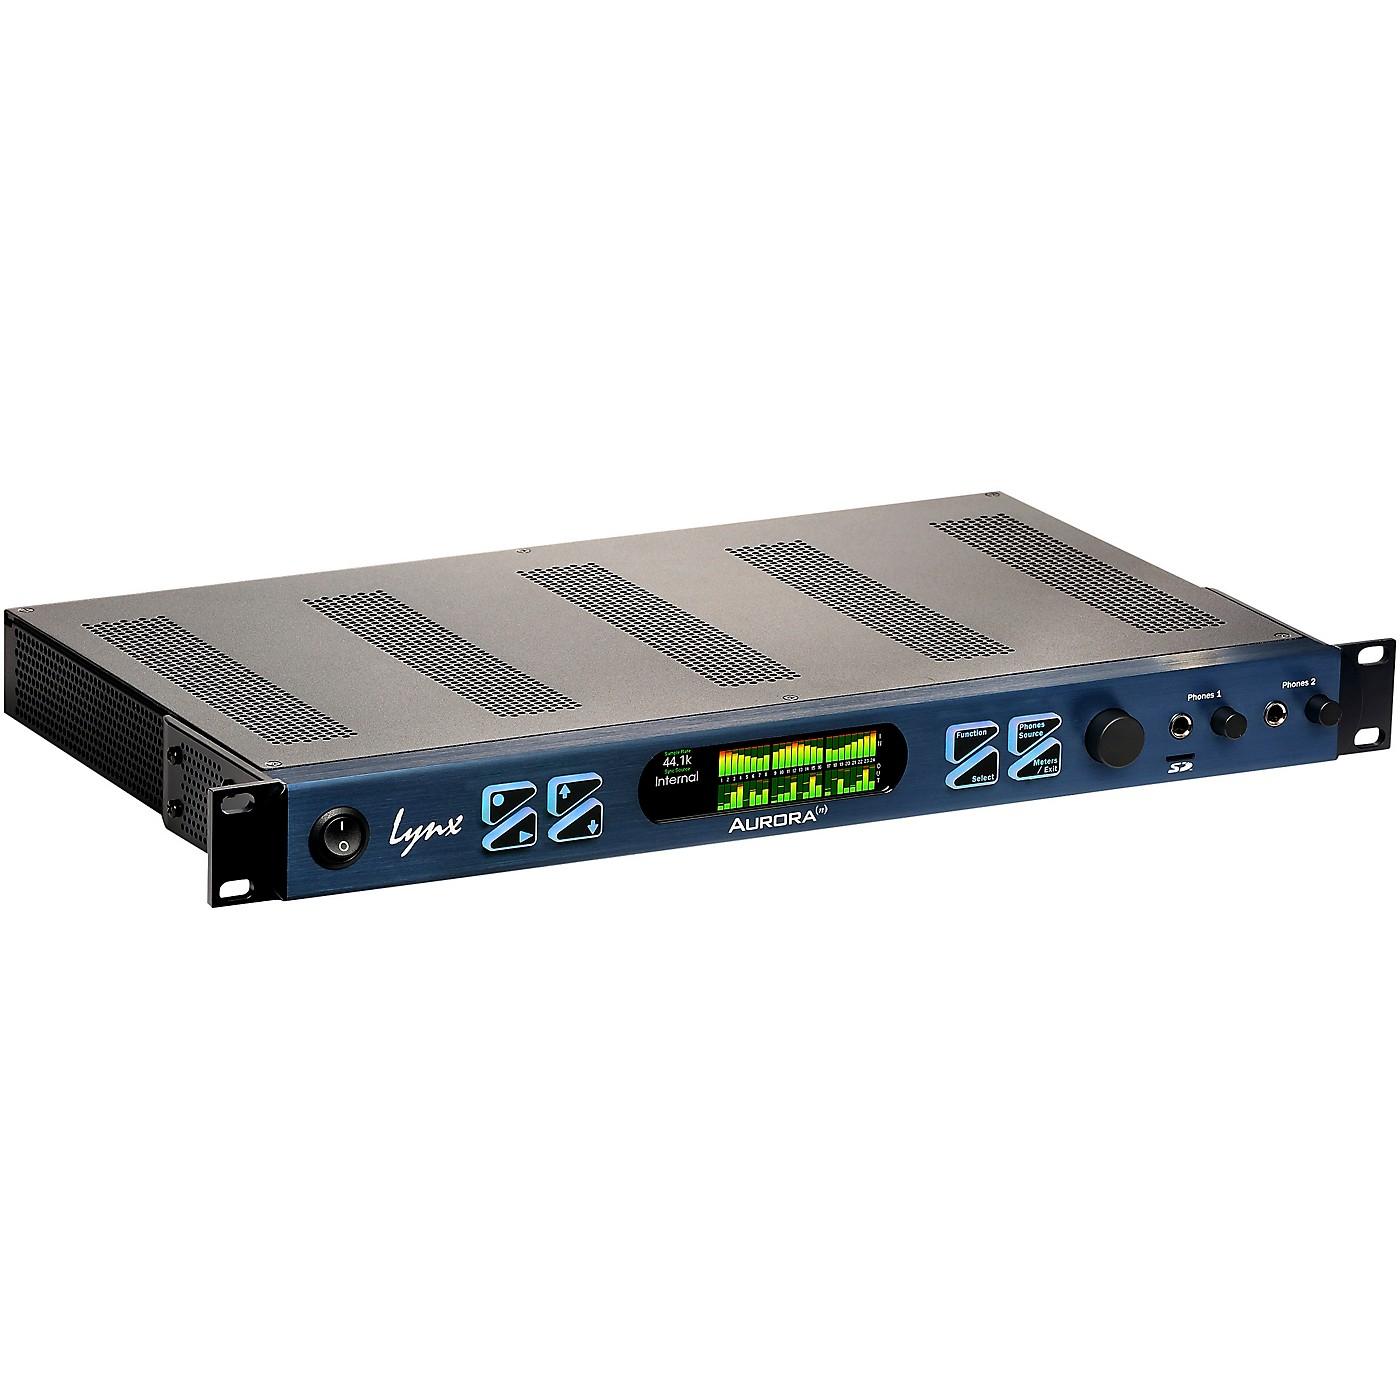 Lynx Aurora(n) 24 Thunderbolt Audio Interface thumbnail